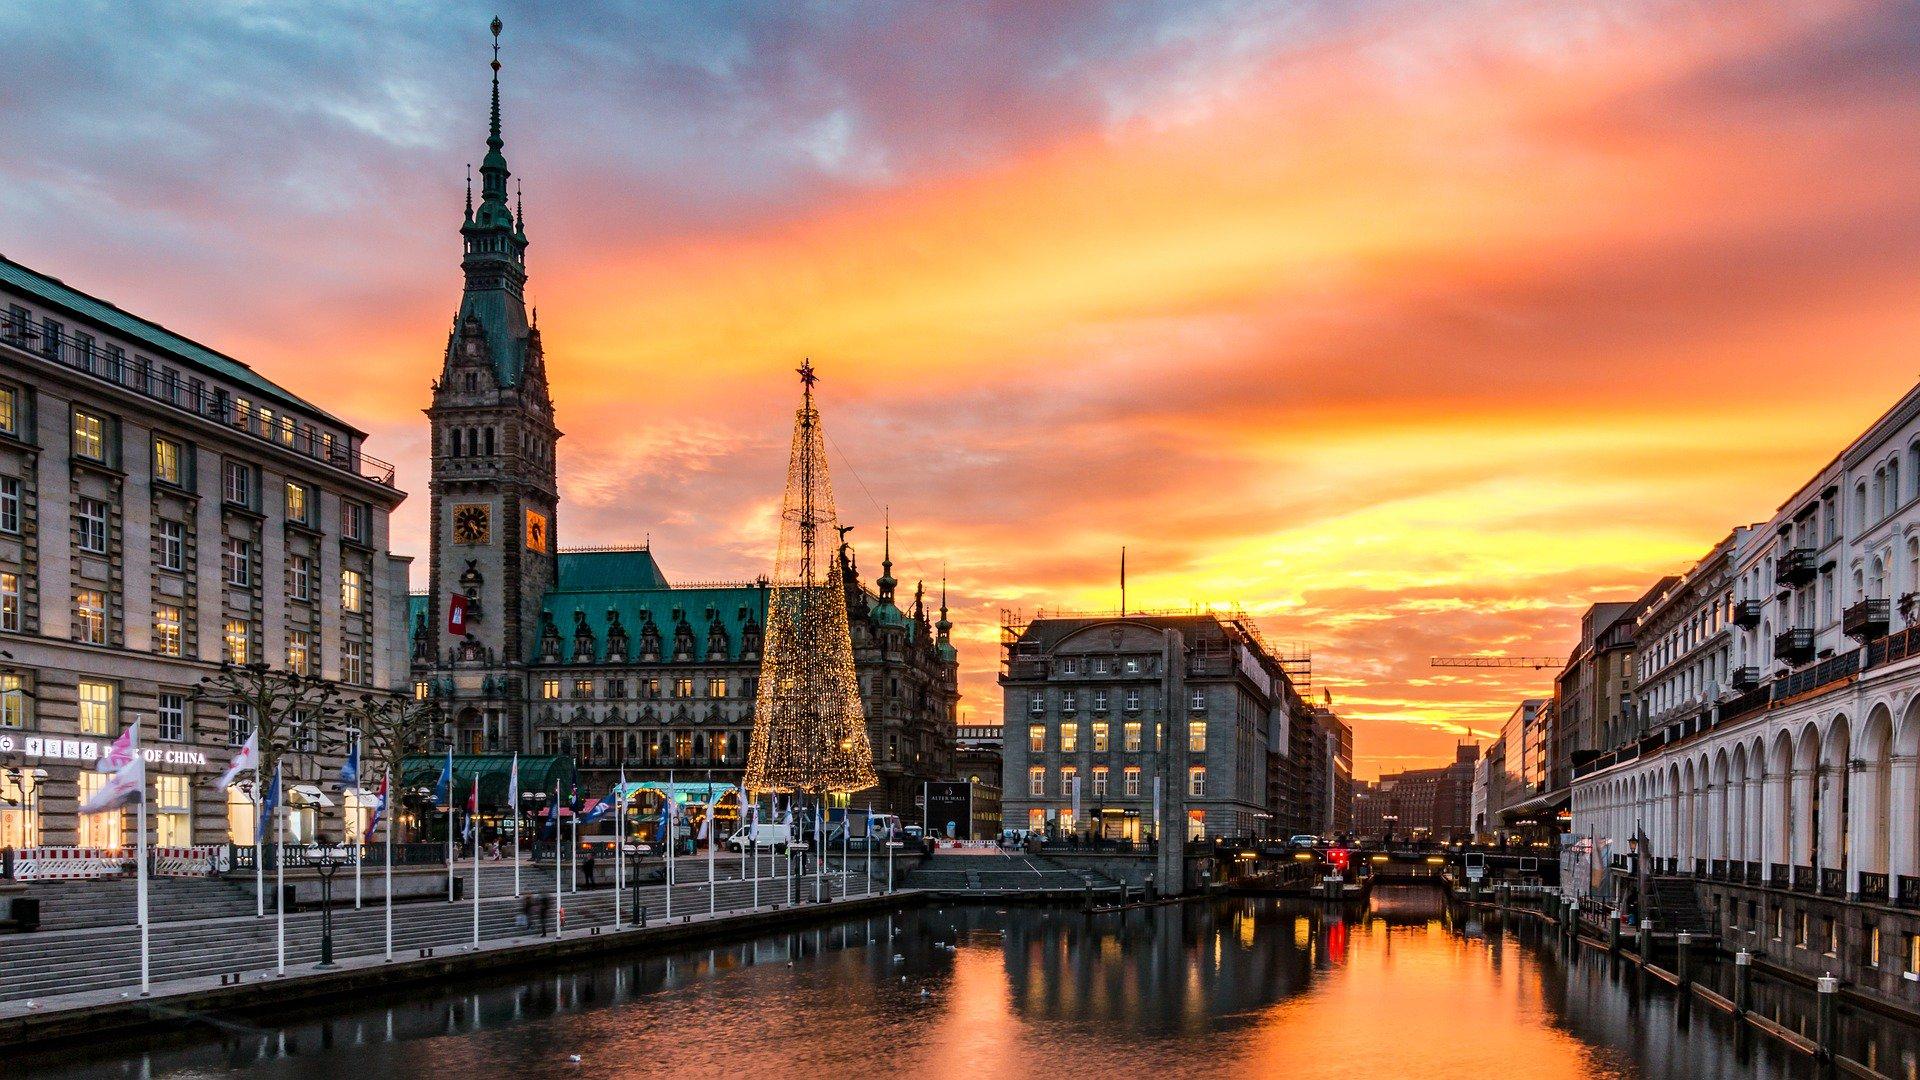 Hamburg canal sunset